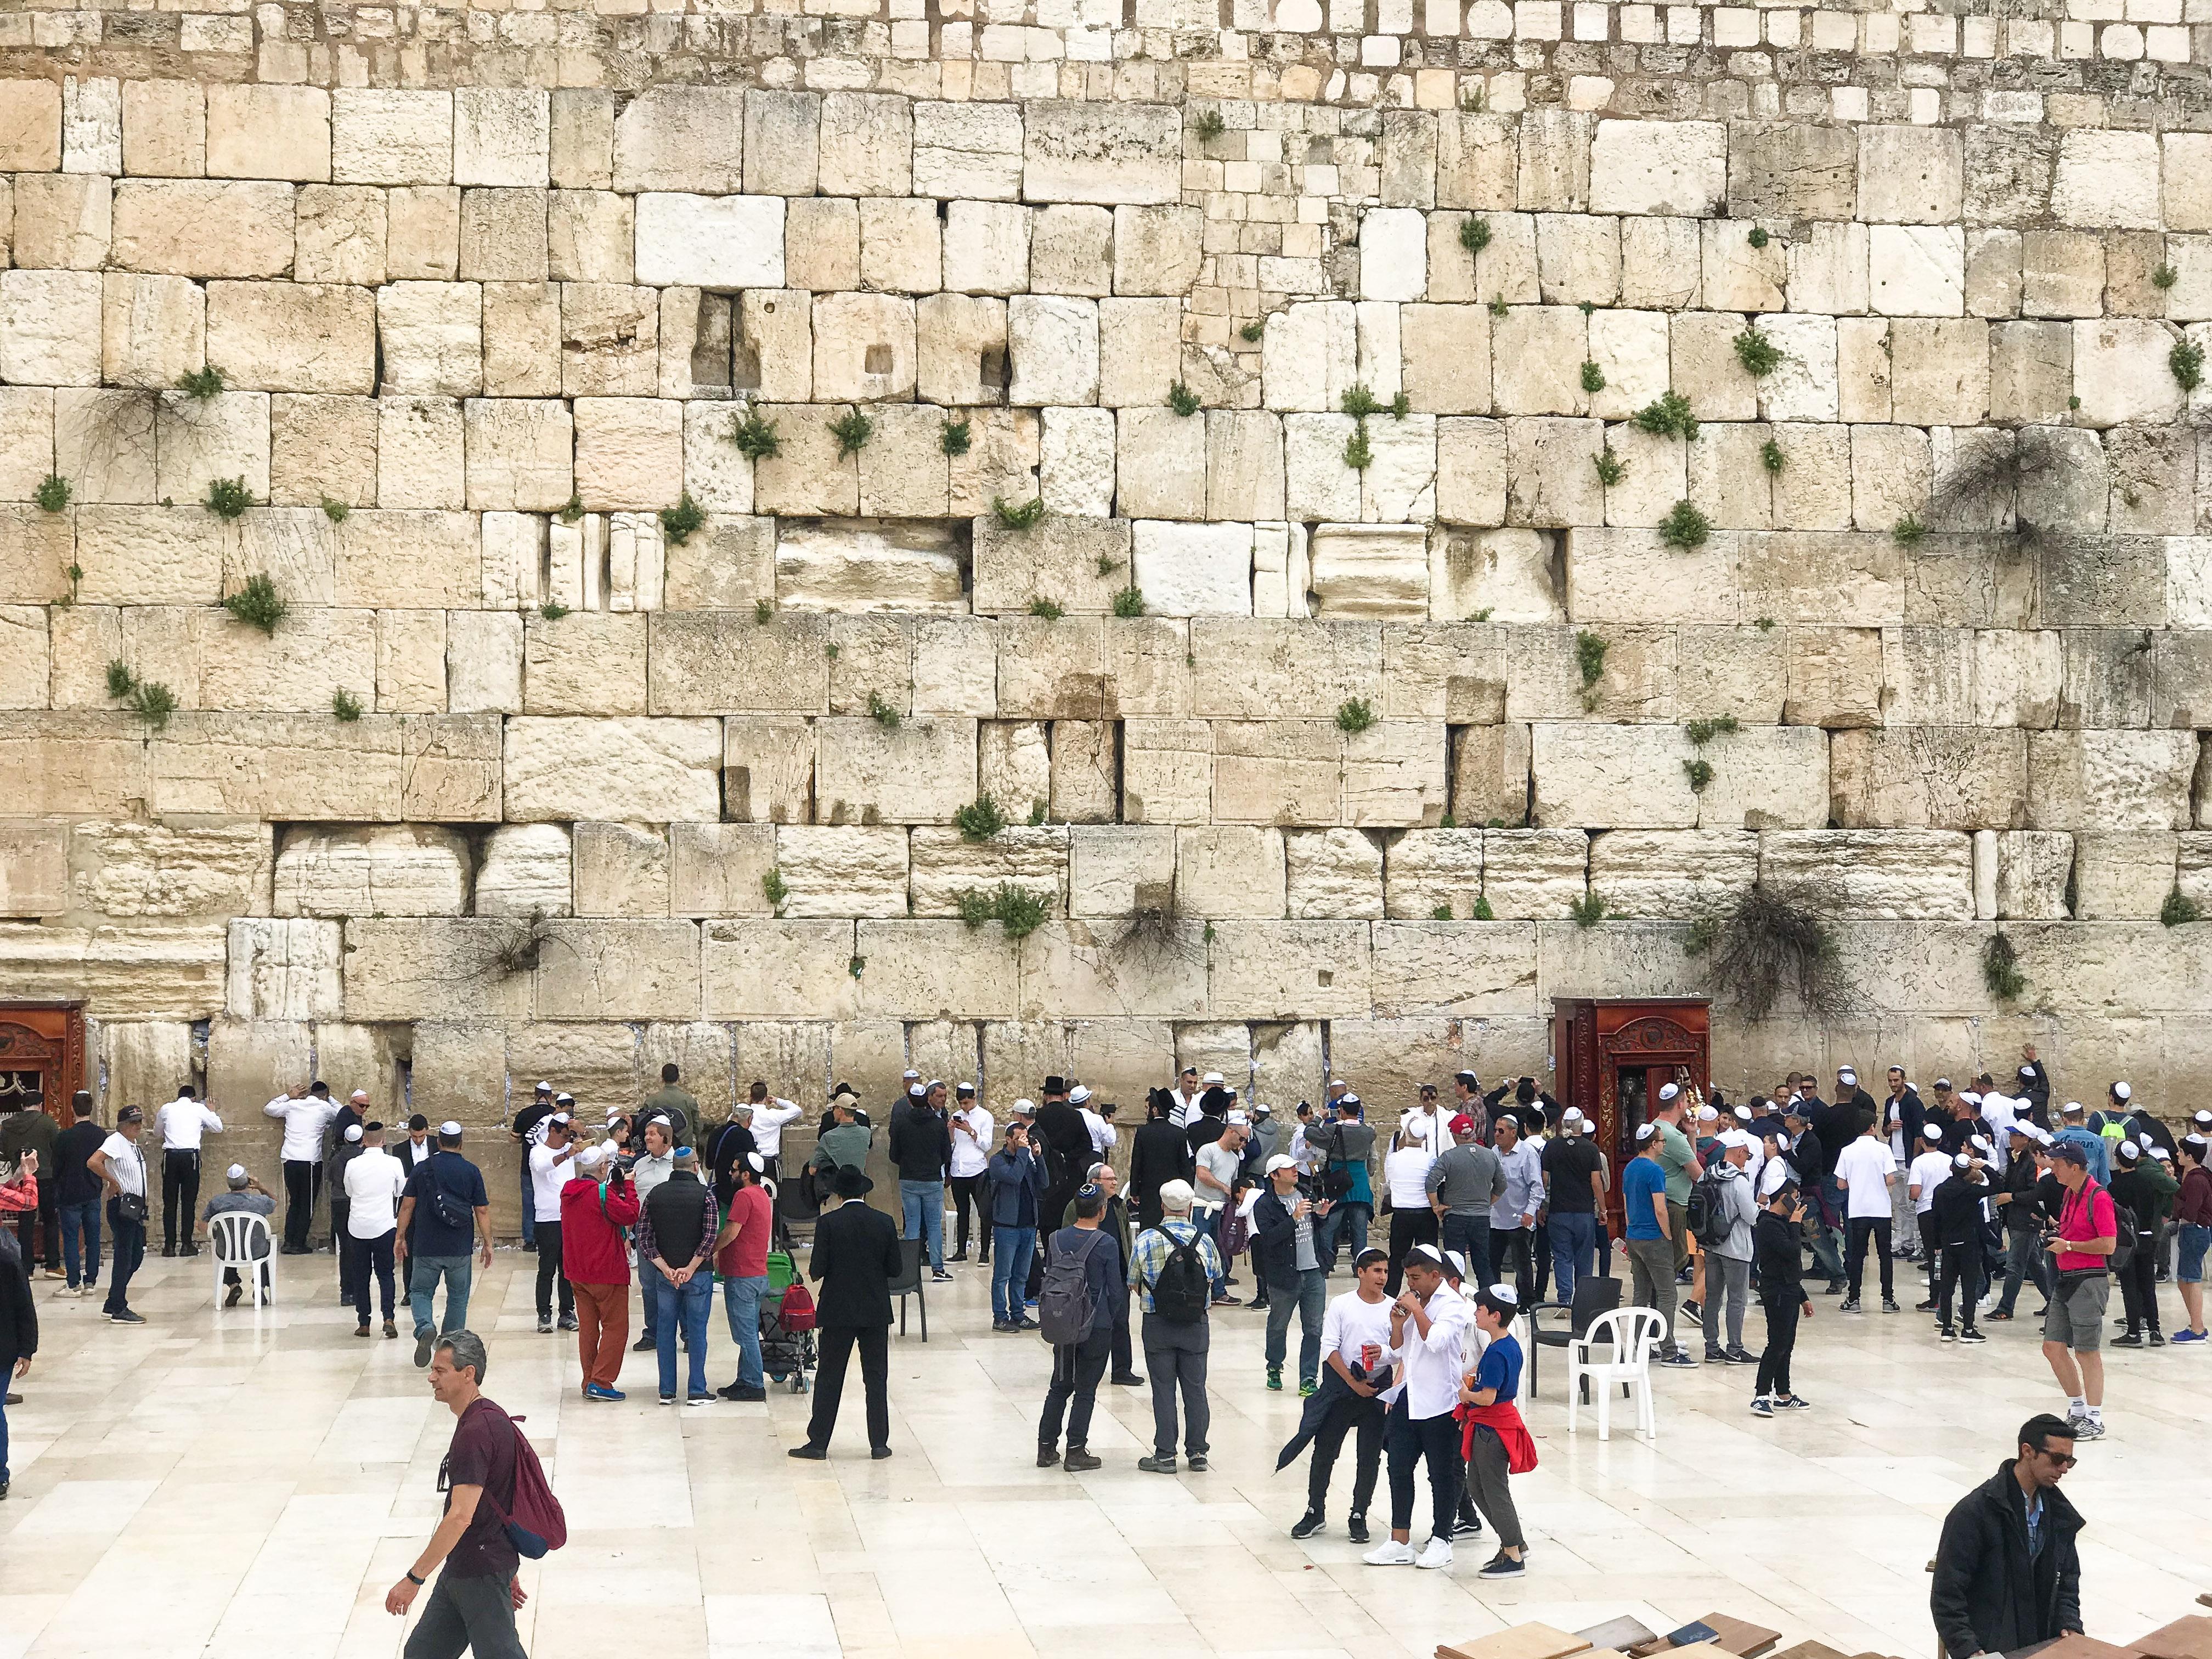 Jerusalem Kids - Western Wall - Wailing Wall